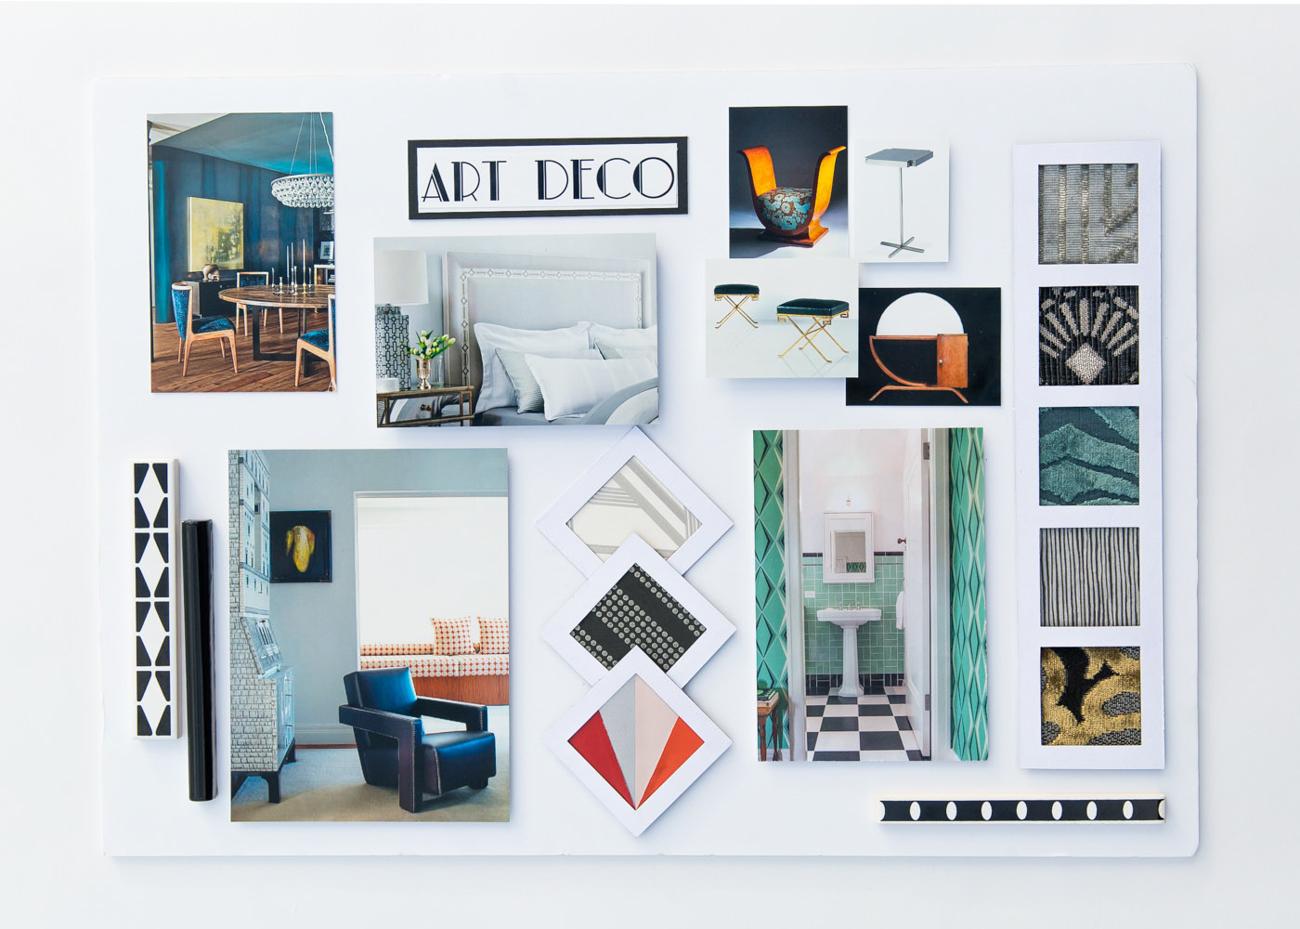 sydney school of architecture style pdf